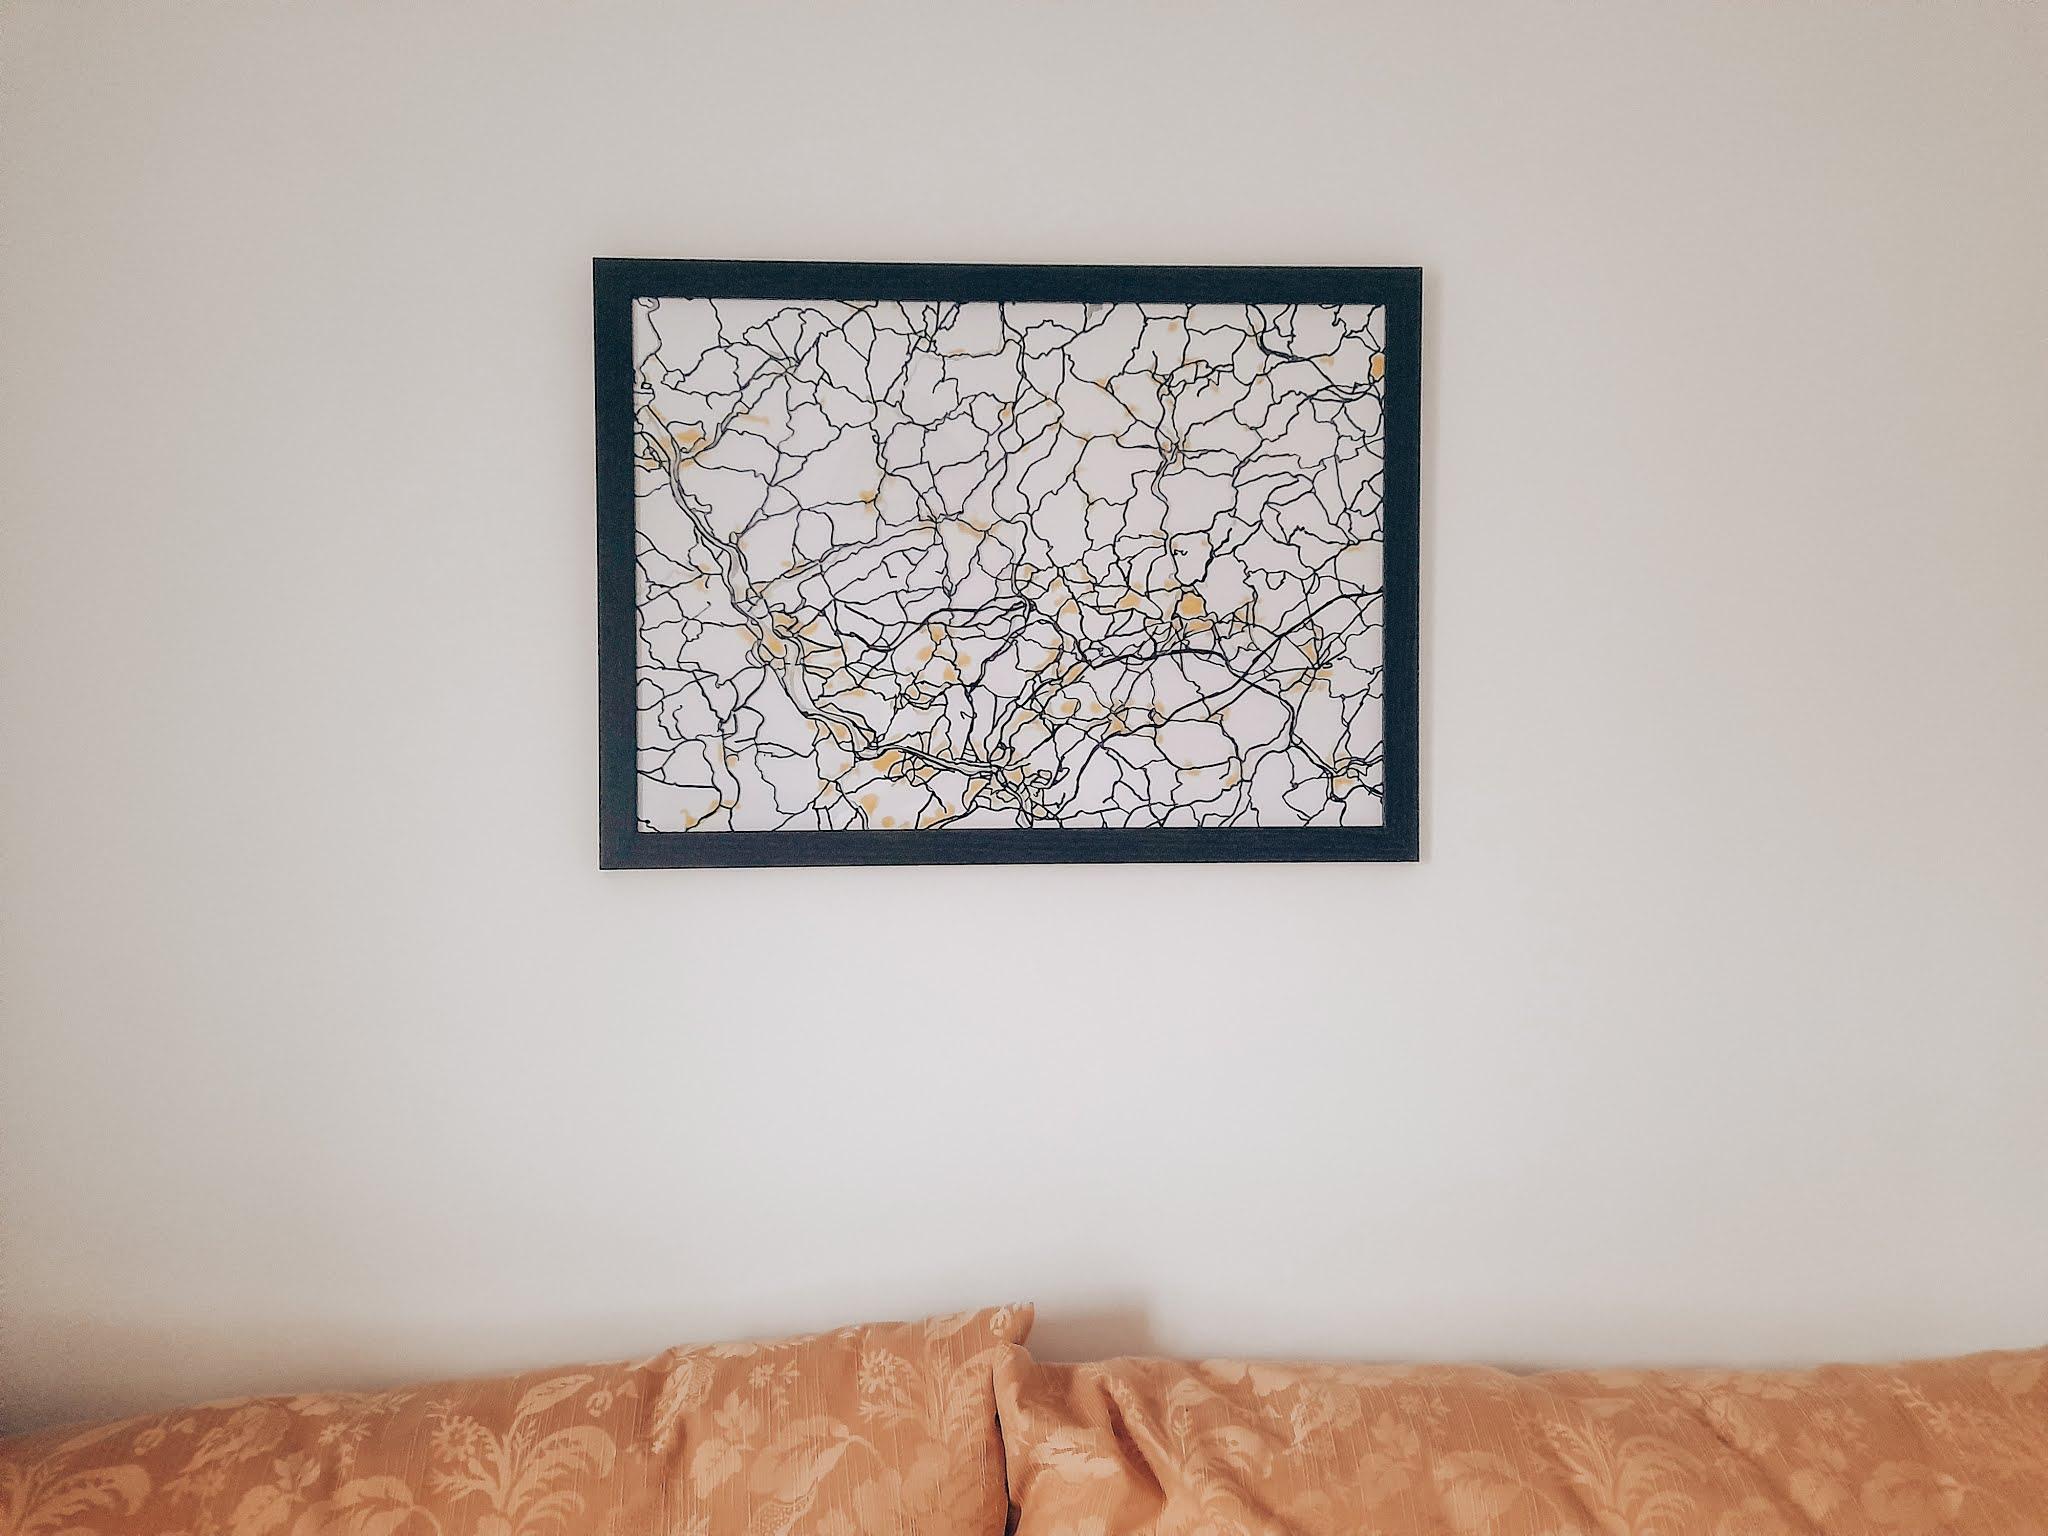 Roadmap Wall Art Homedecoration